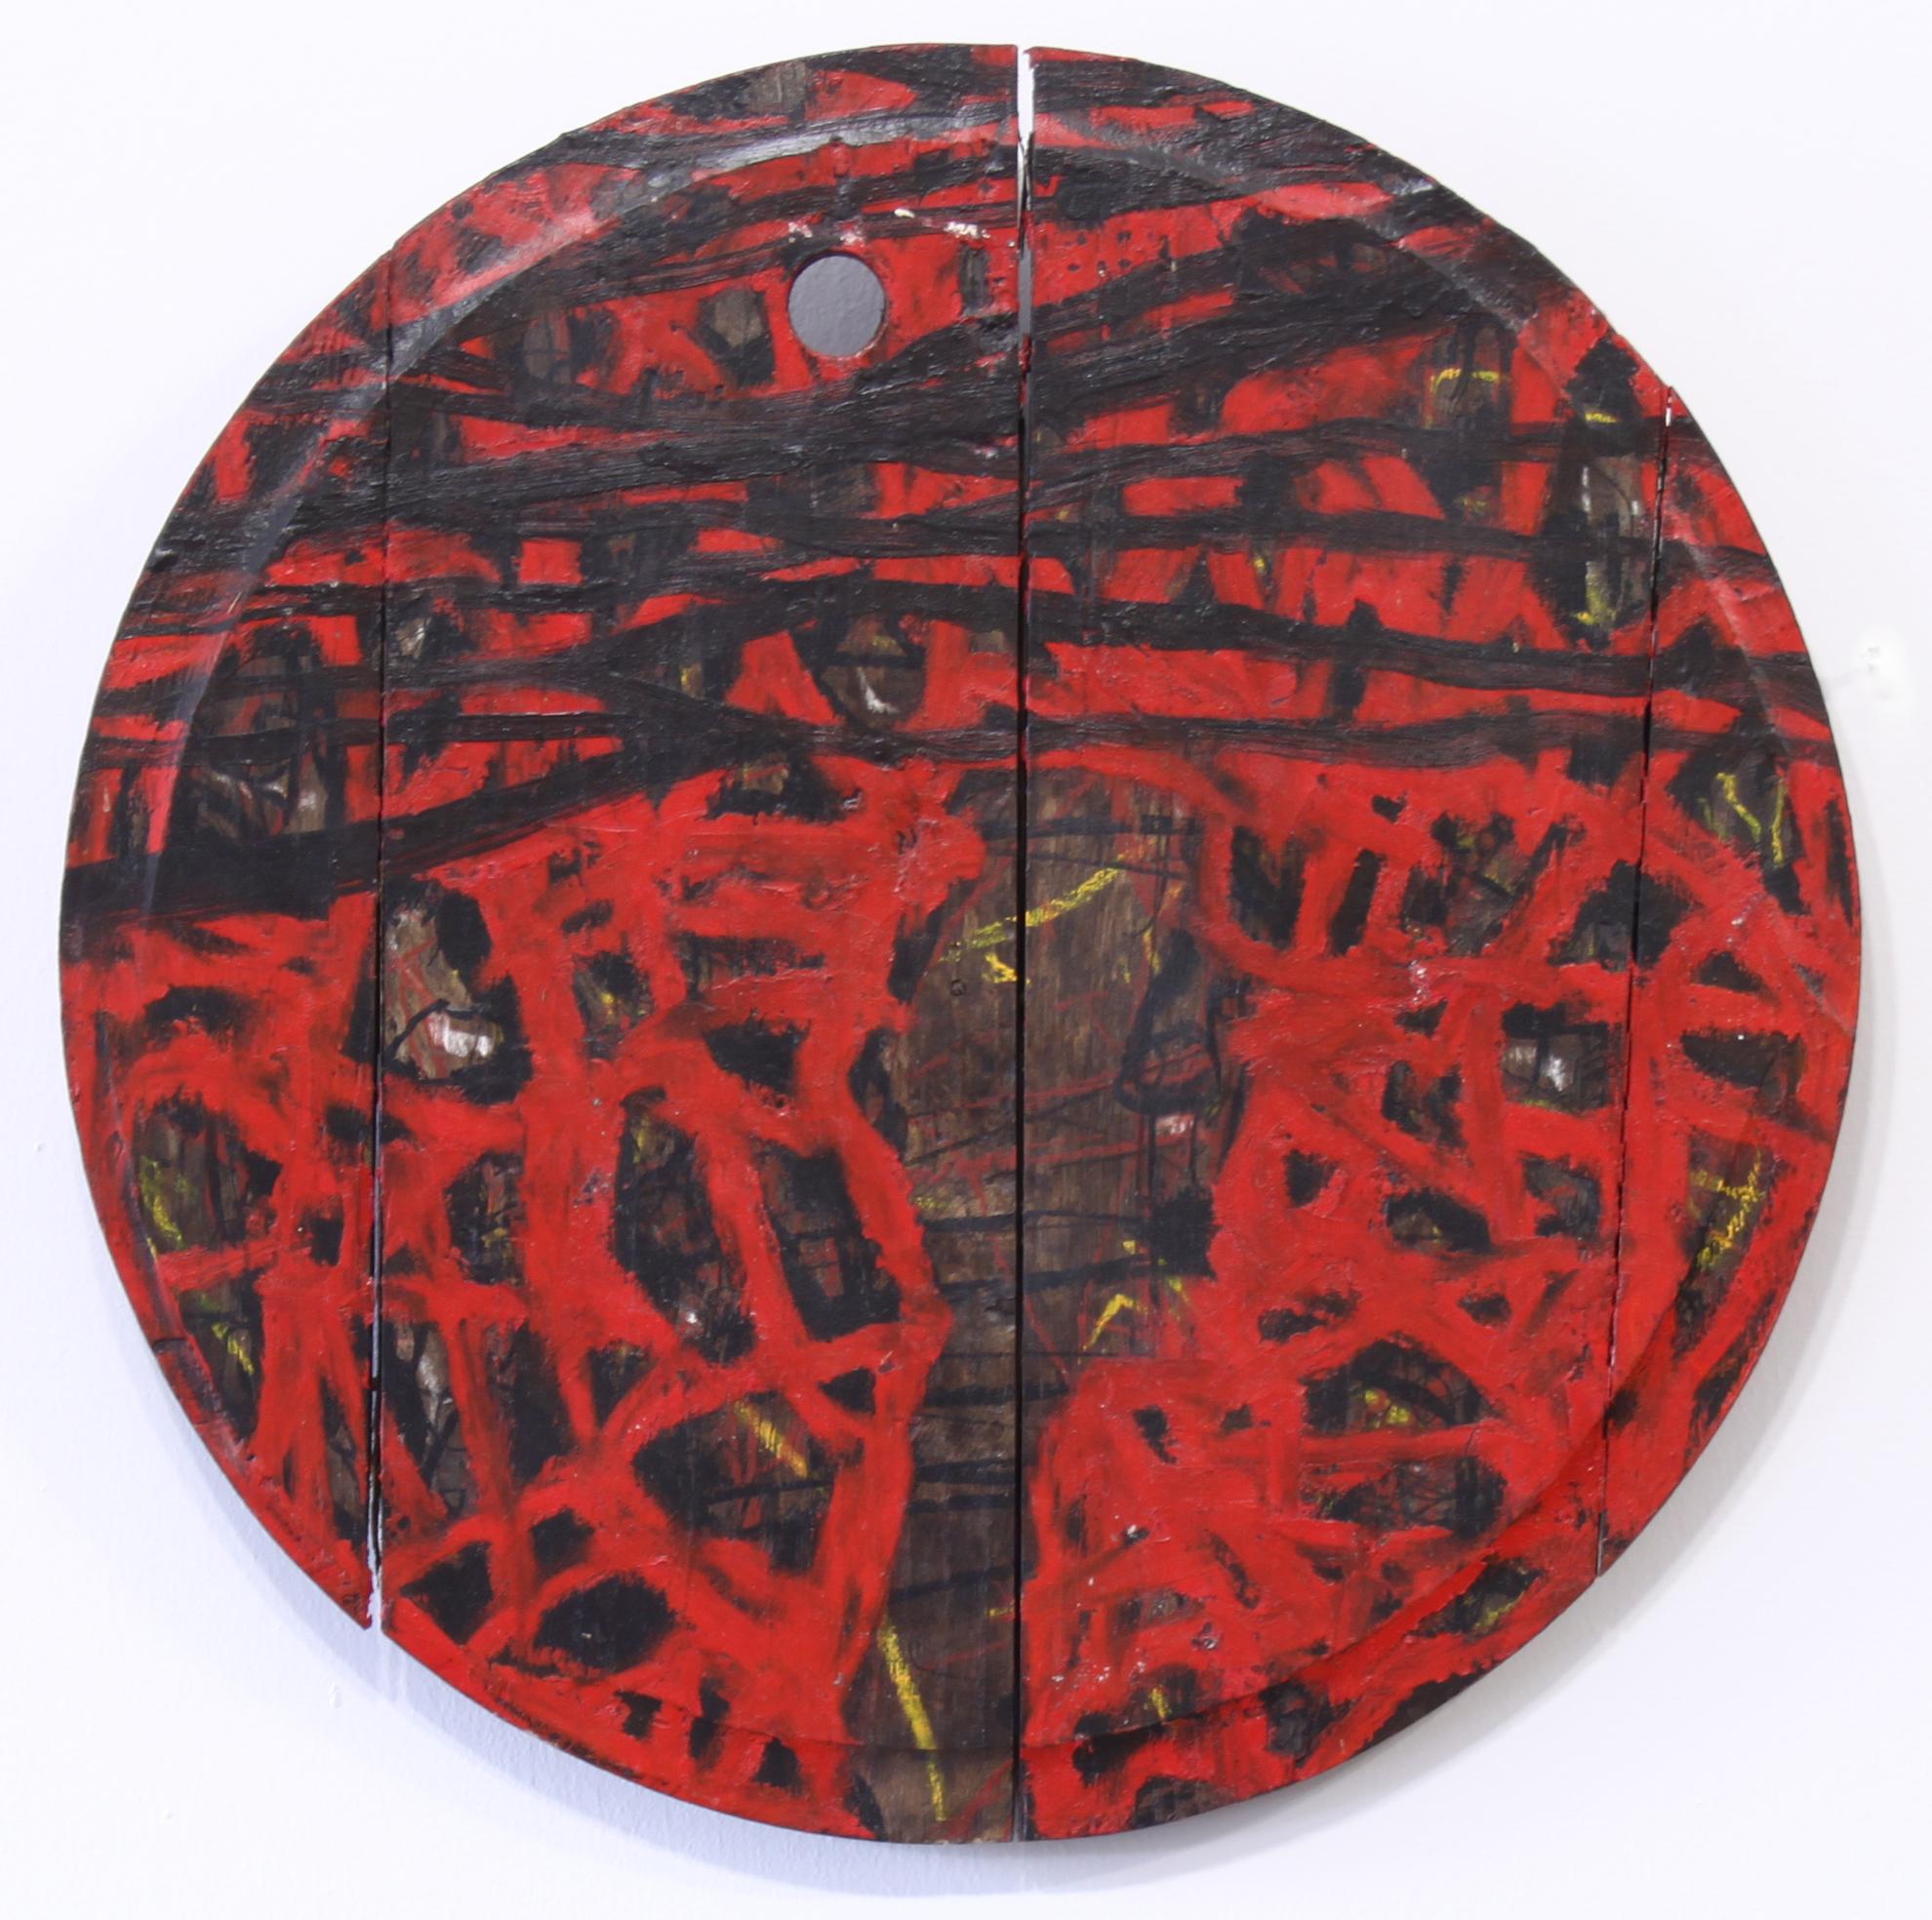 "Eduard Bousrd Bangerl  Titel : ""o.T."" (Fassdeckel I), 1992 Technik : Mischtechnik auf Holzfassdeckel Format : 51,5 cm"